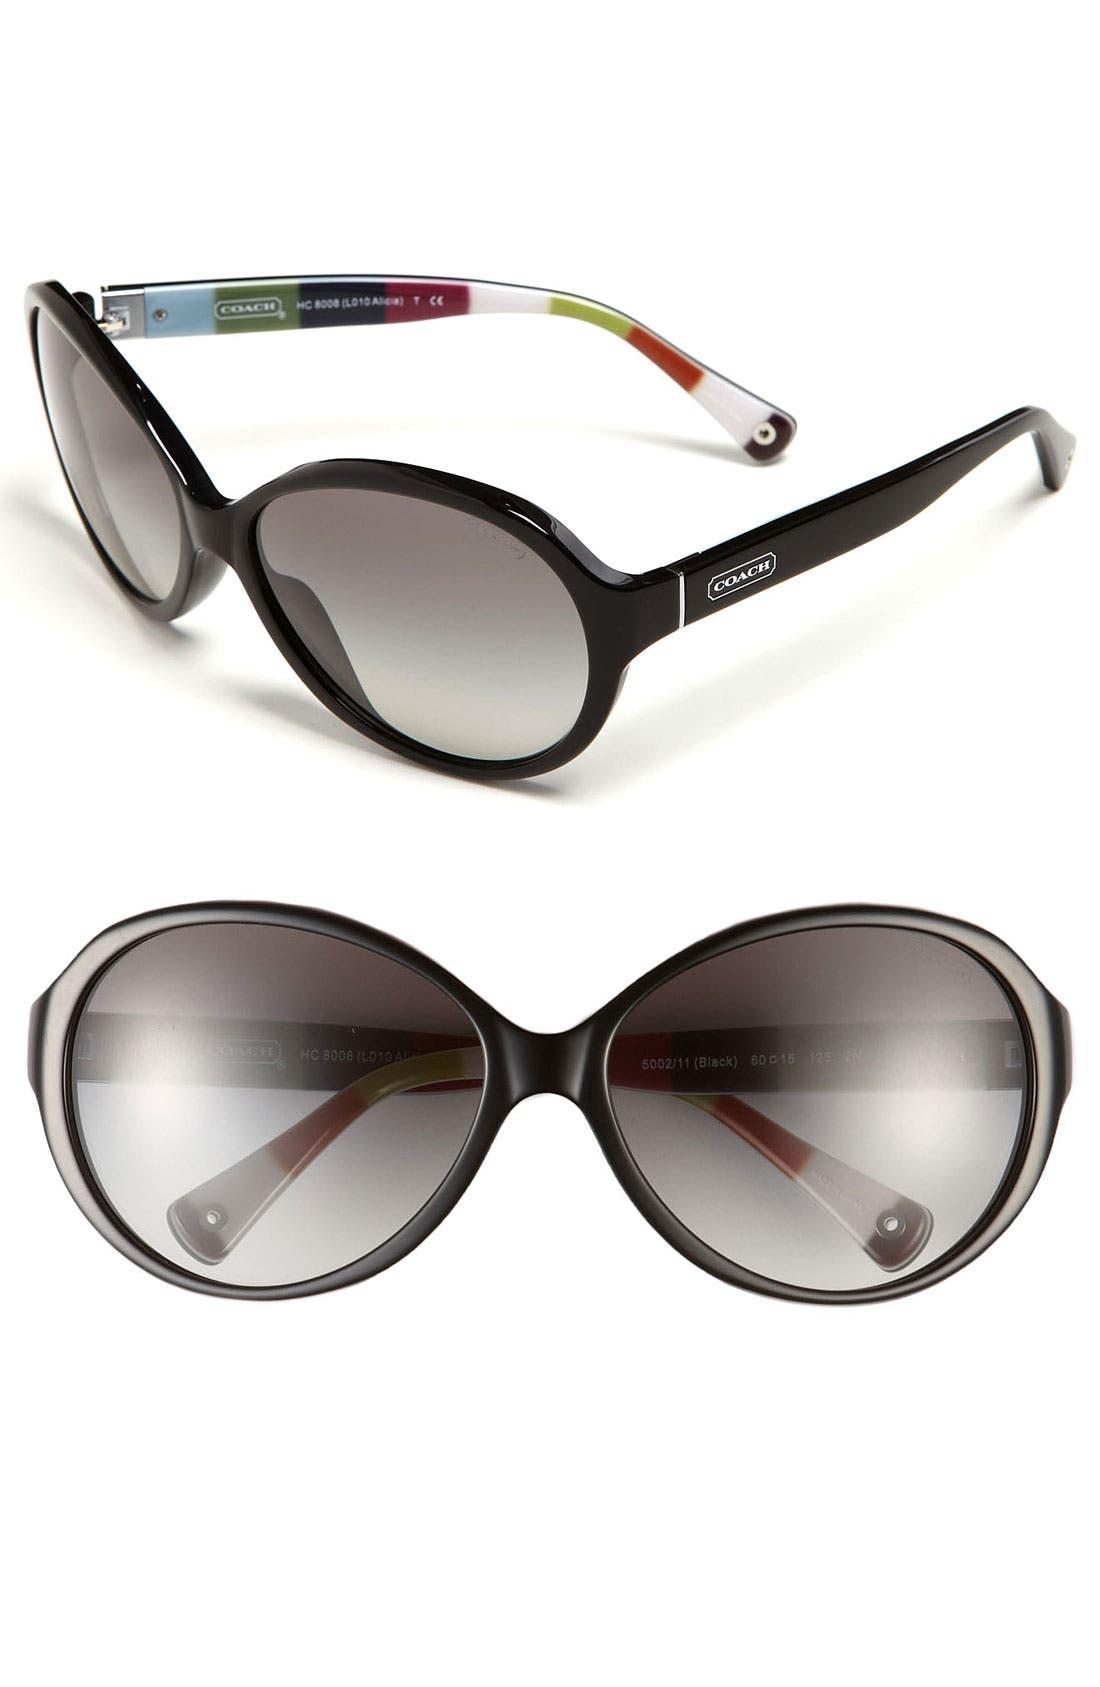 Alternate Image 1 Selected - COACH Gradient Lens Sunglasses